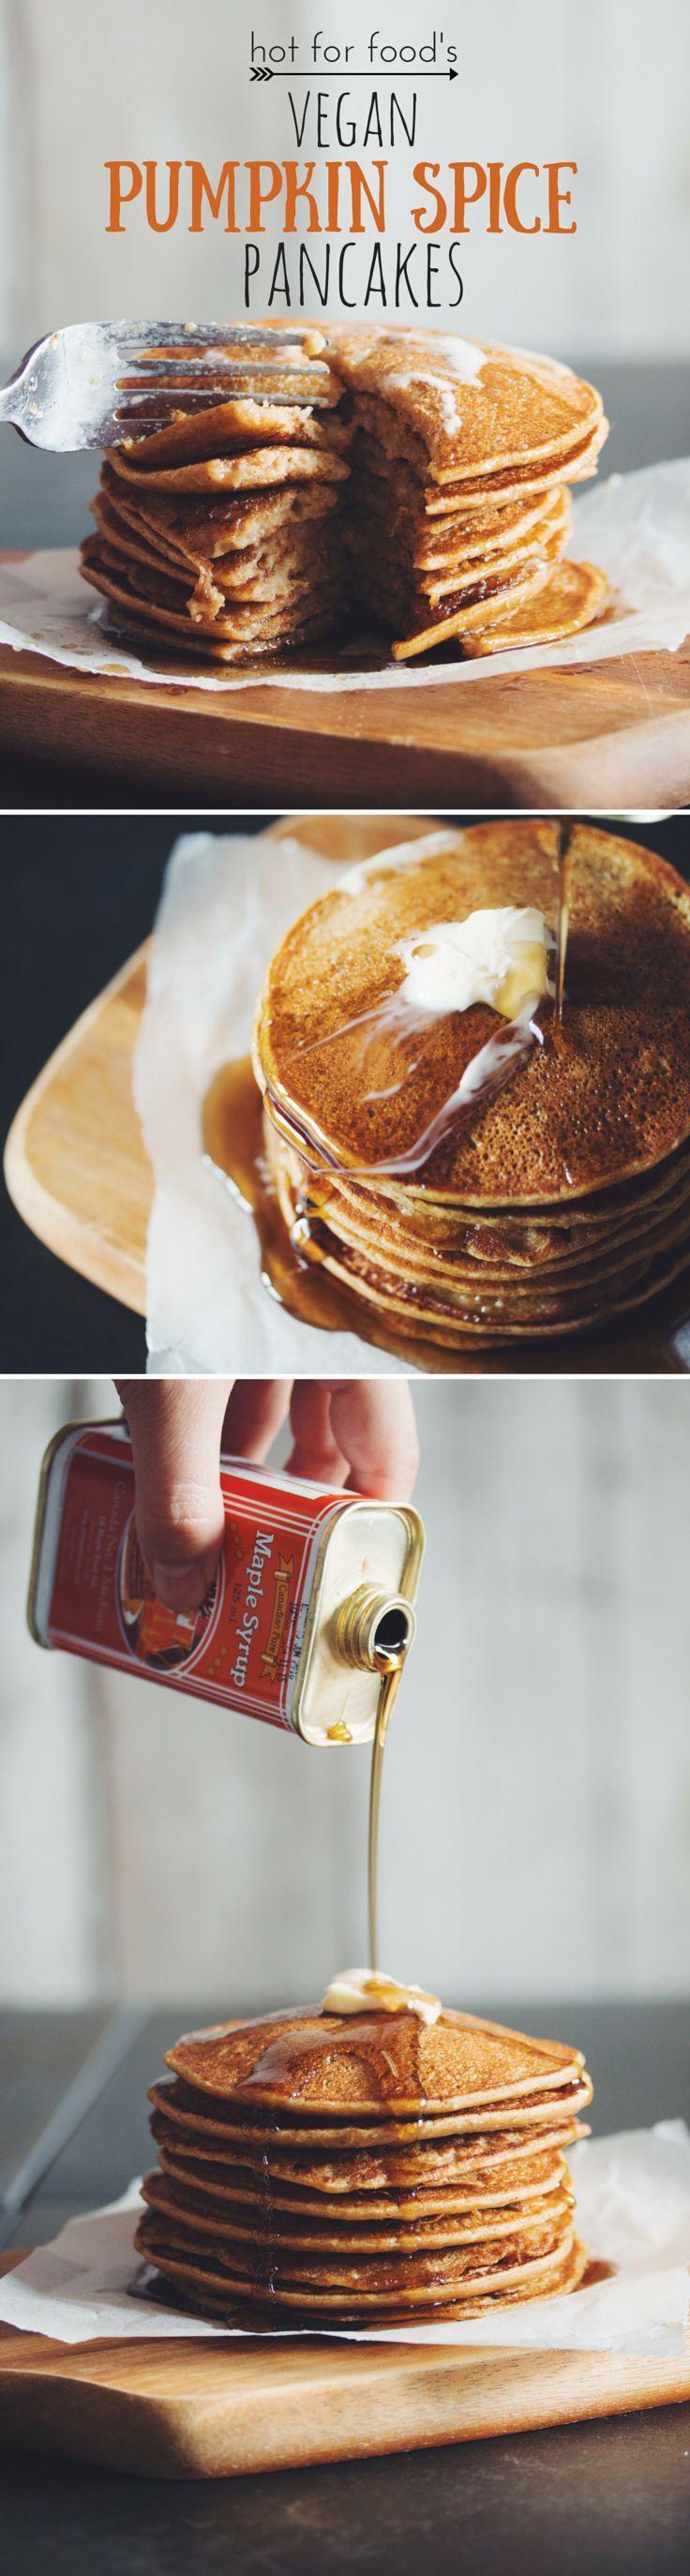 #vegan pumpkin spice pancakes   RECIPE on http://hotforfoodblog.com